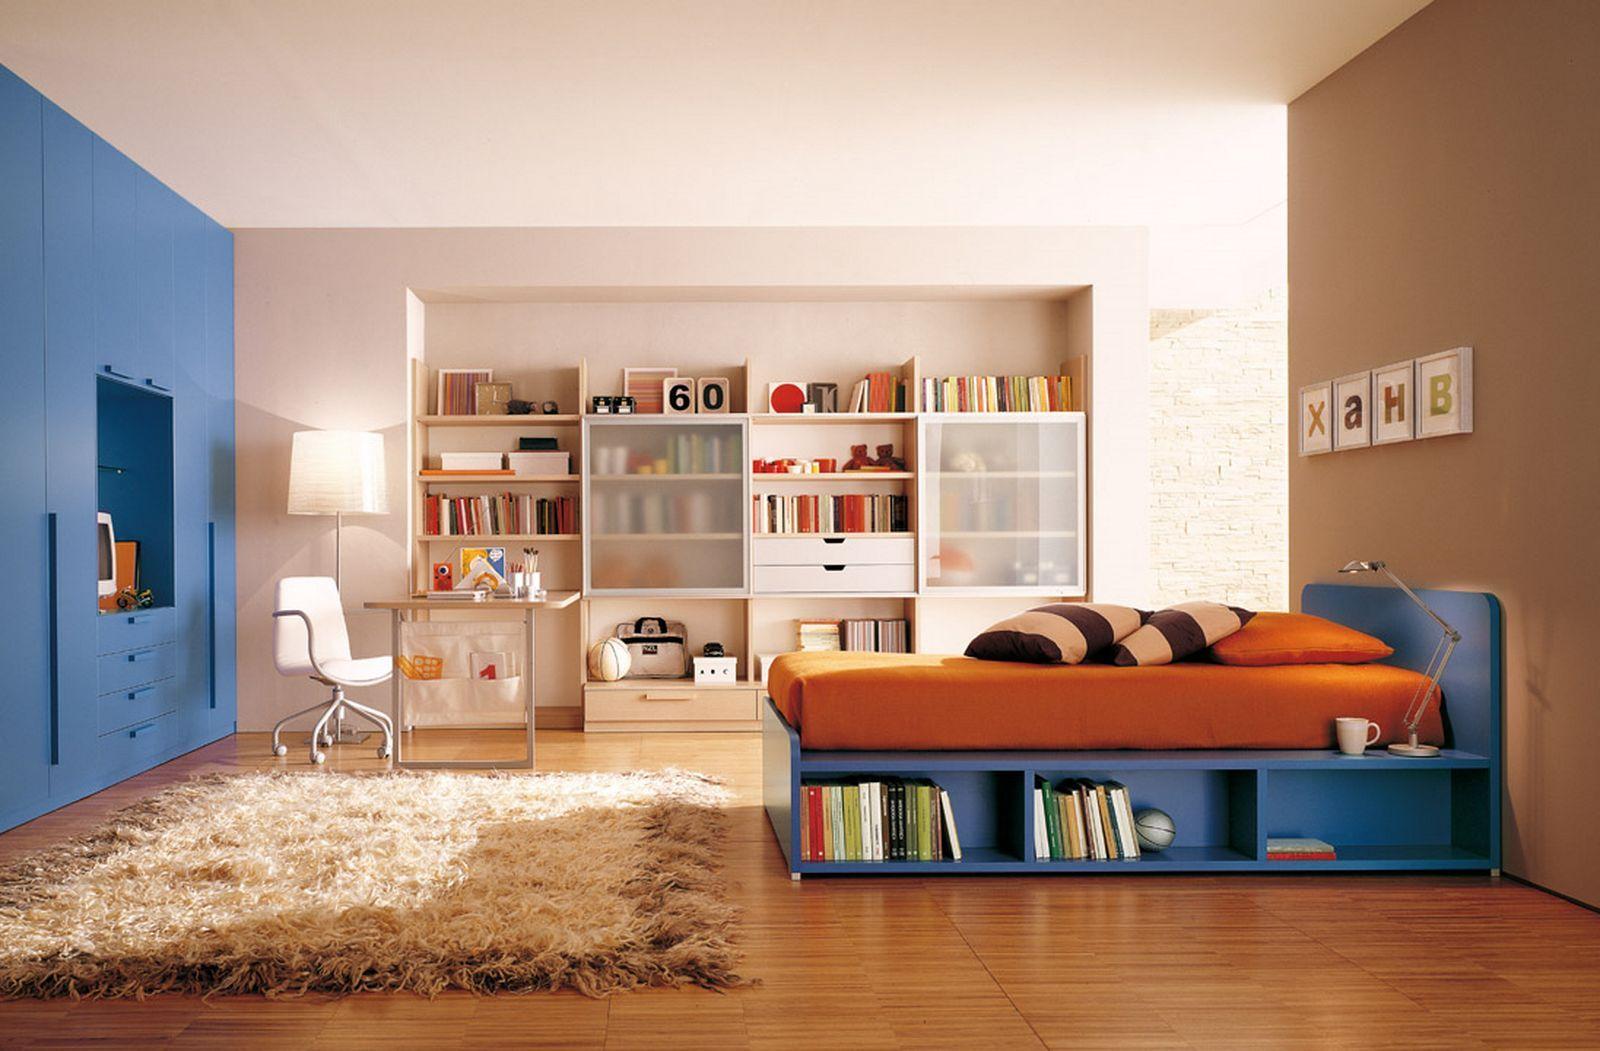 Details about kids bedroom incredible design modern kids room furniture for rich people incredible design kids